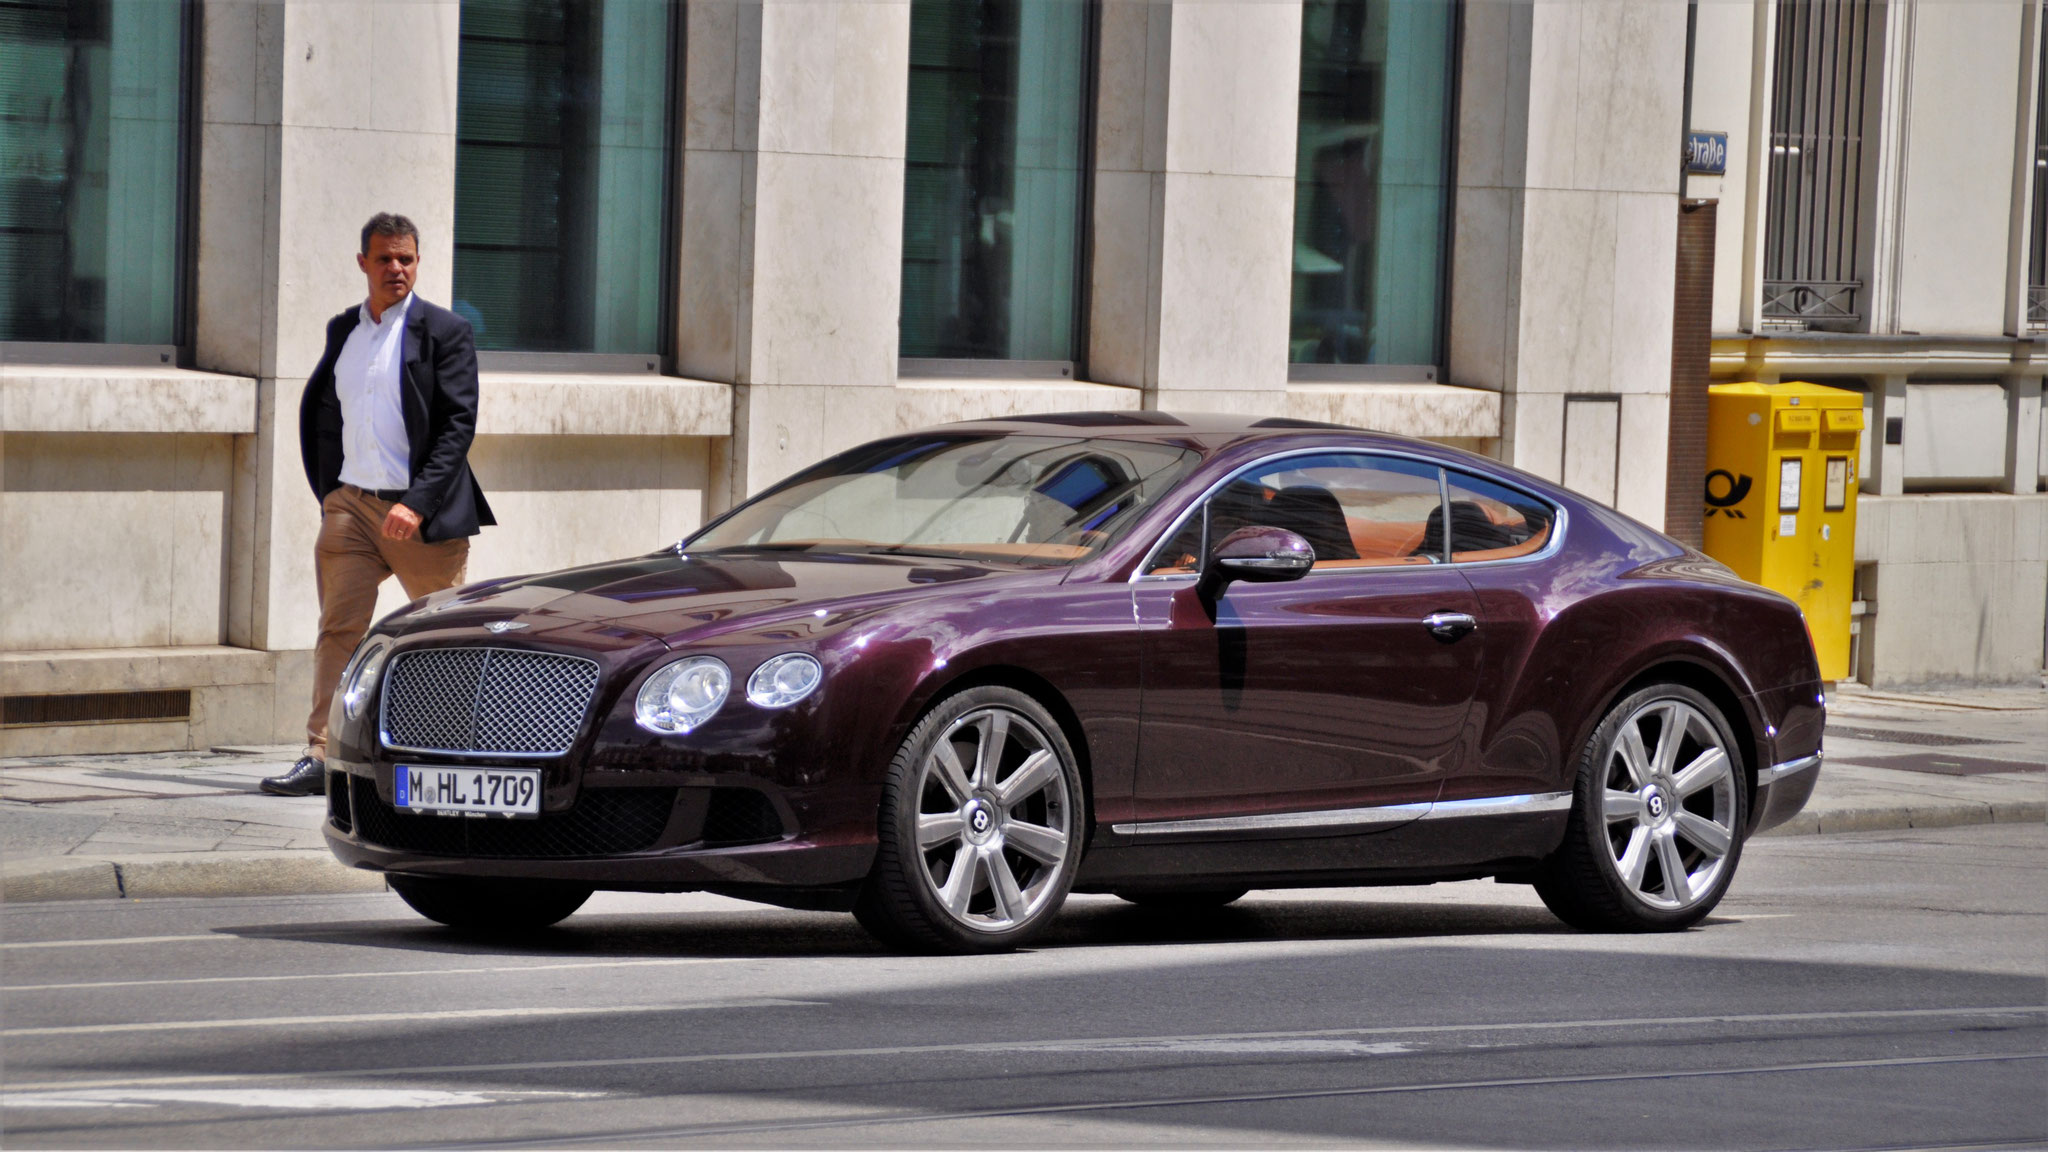 Bentley Continental GT - M-HL-1709